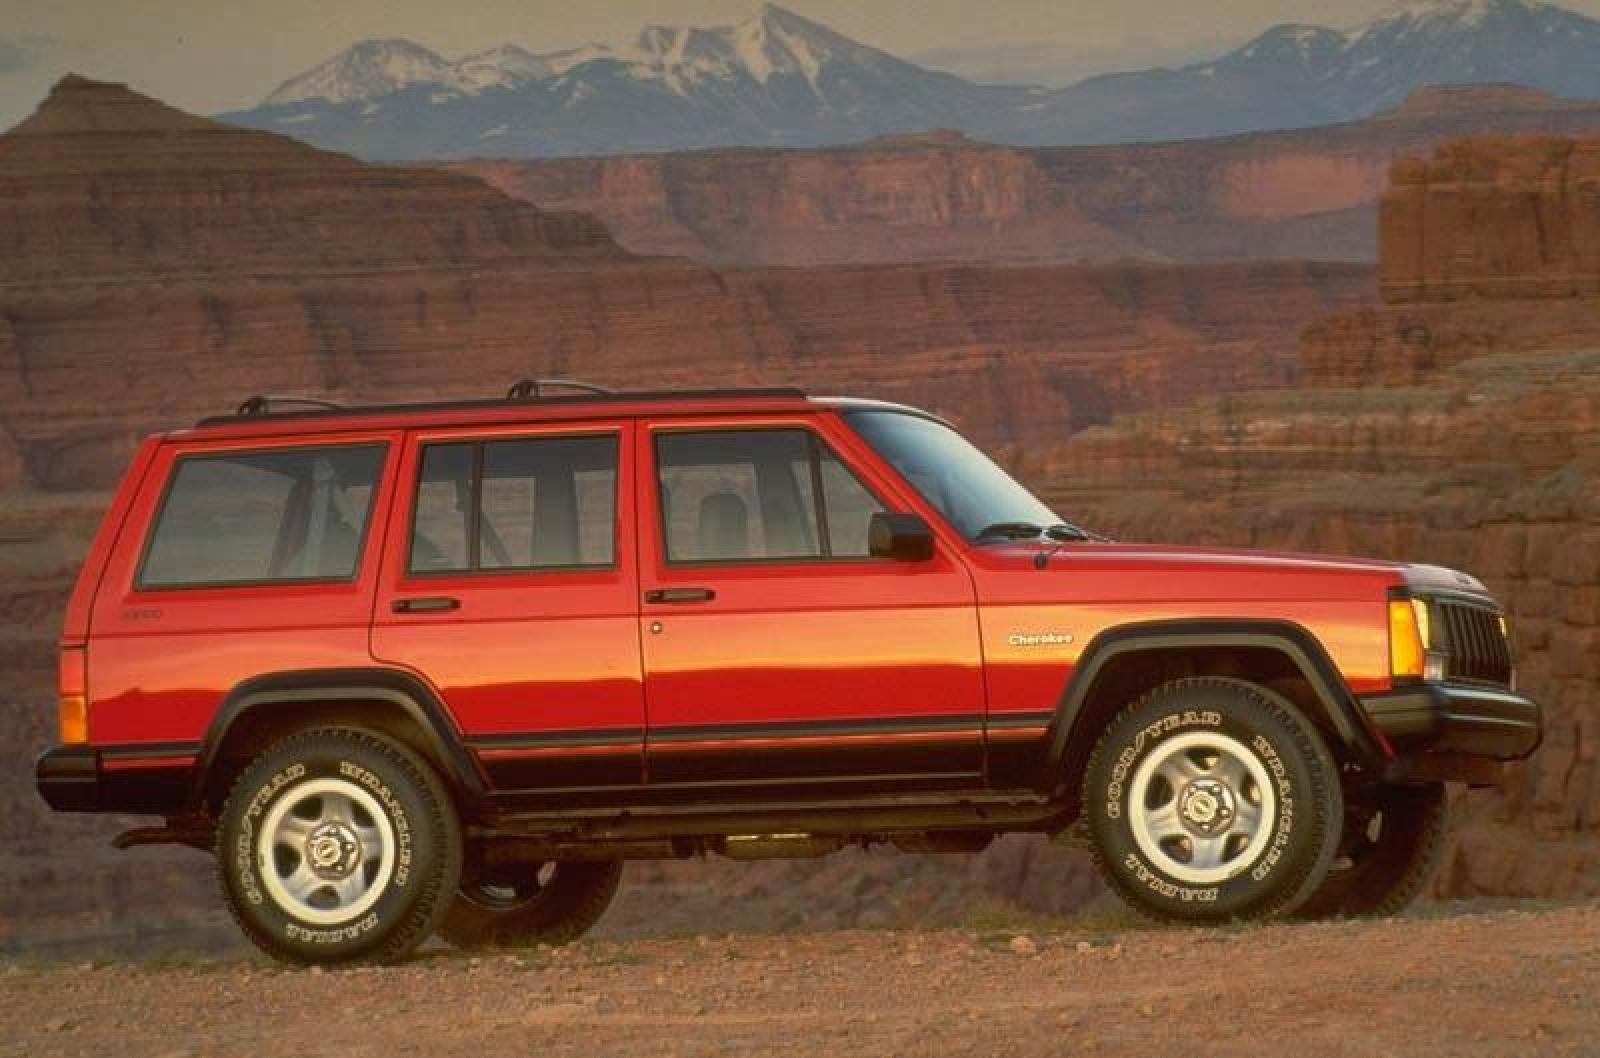 1995 jeep cherokee information and photos zombiedrive 800 1024 1280 1600 origin 1995 jeep cherokee publicscrutiny Gallery